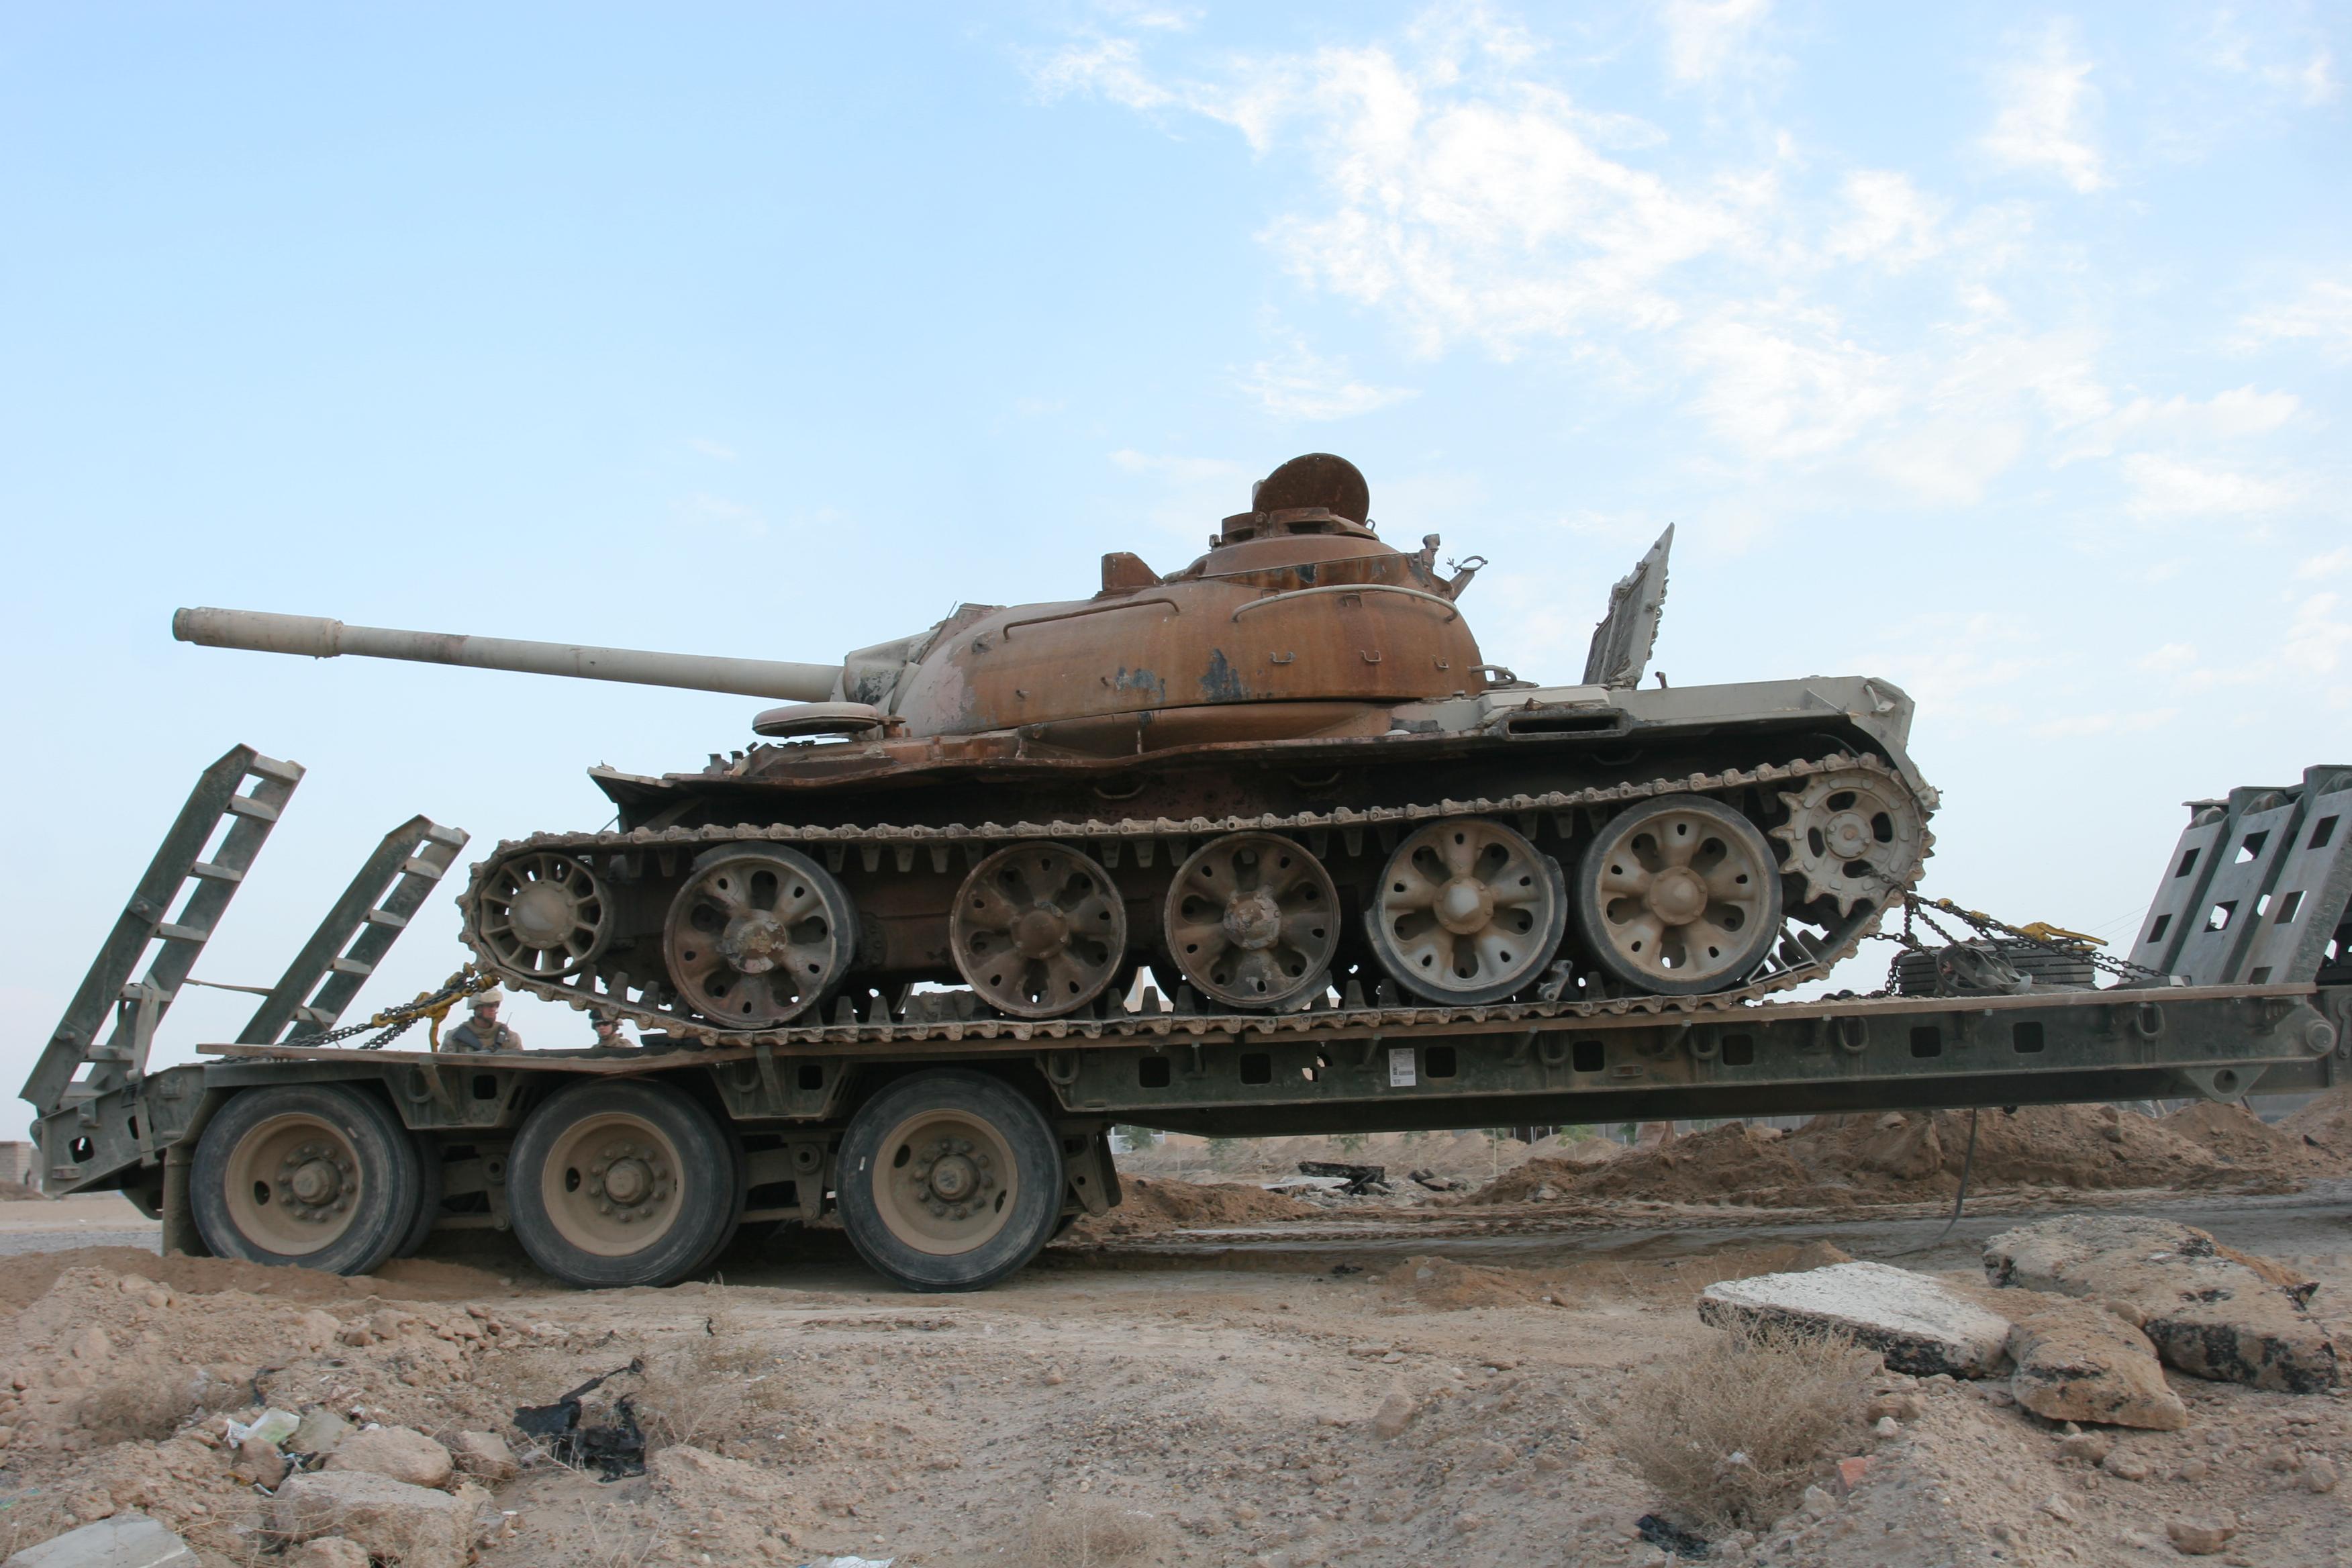 File:Damaged Iraqi T-55A tank.on a trailer on Al Anbar ...